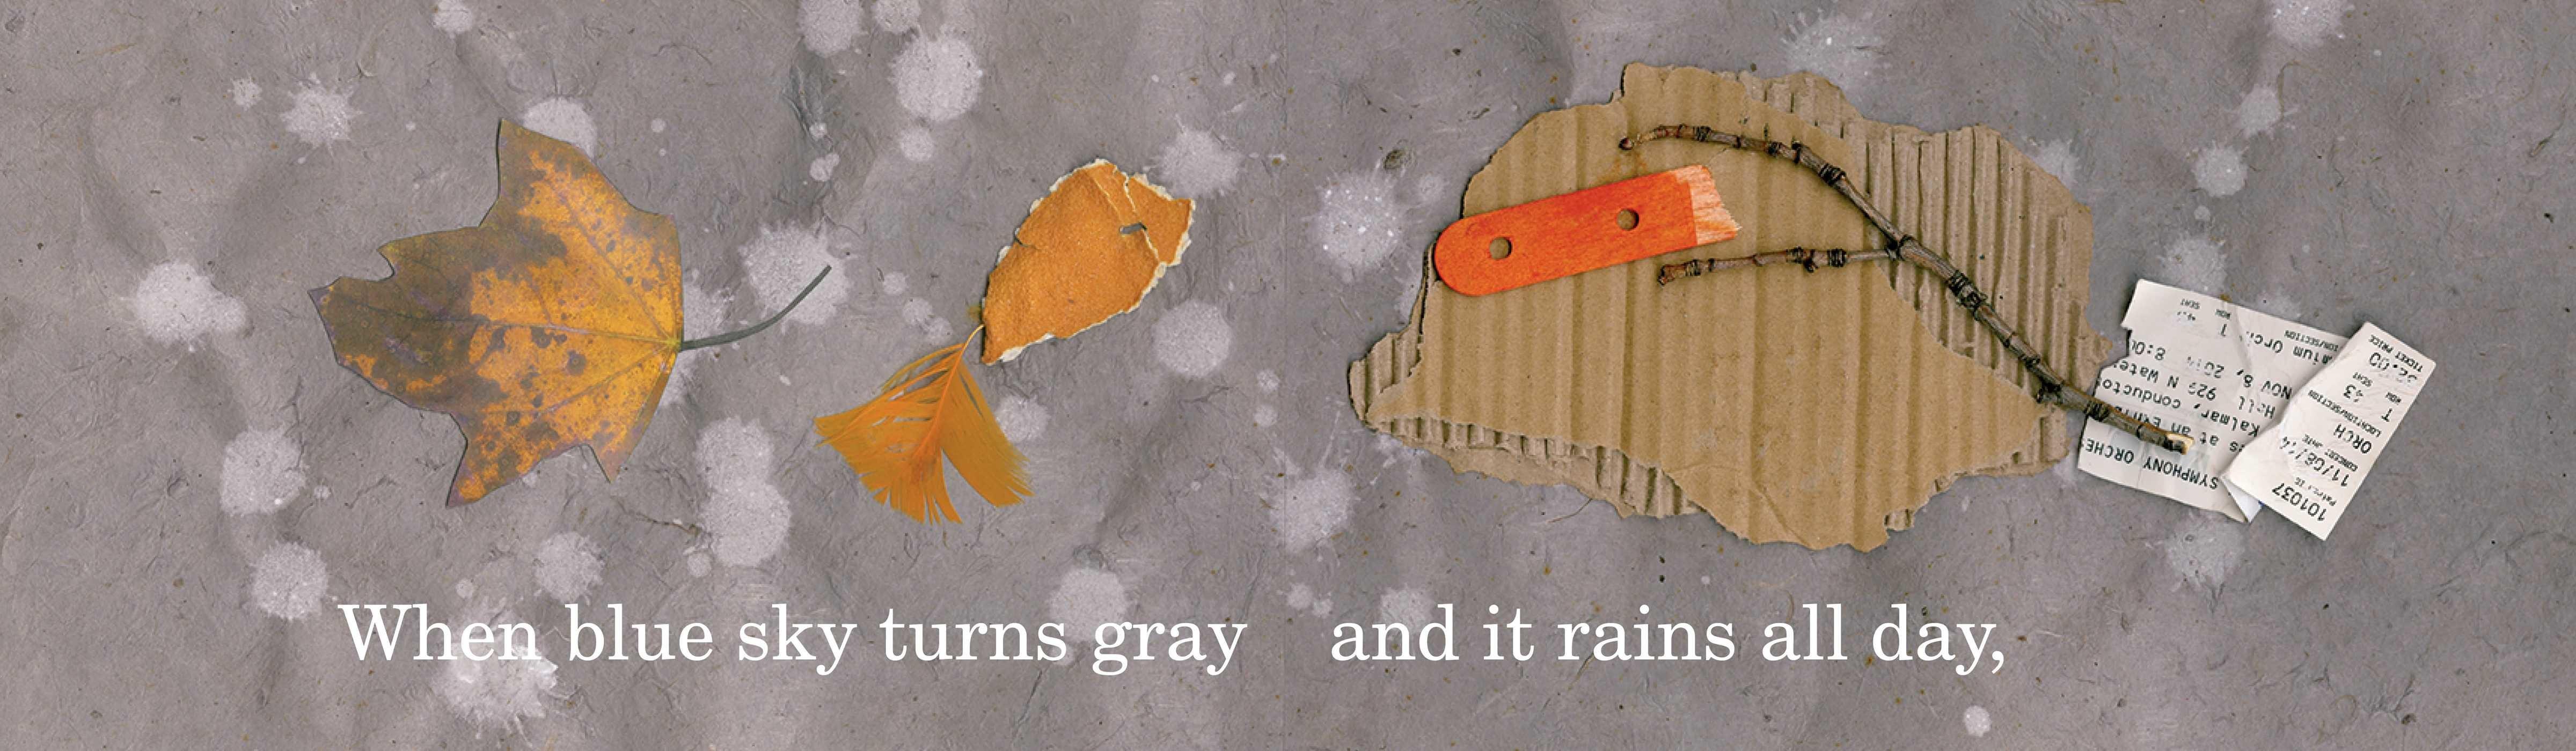 Rain fish 9781481461528.in01